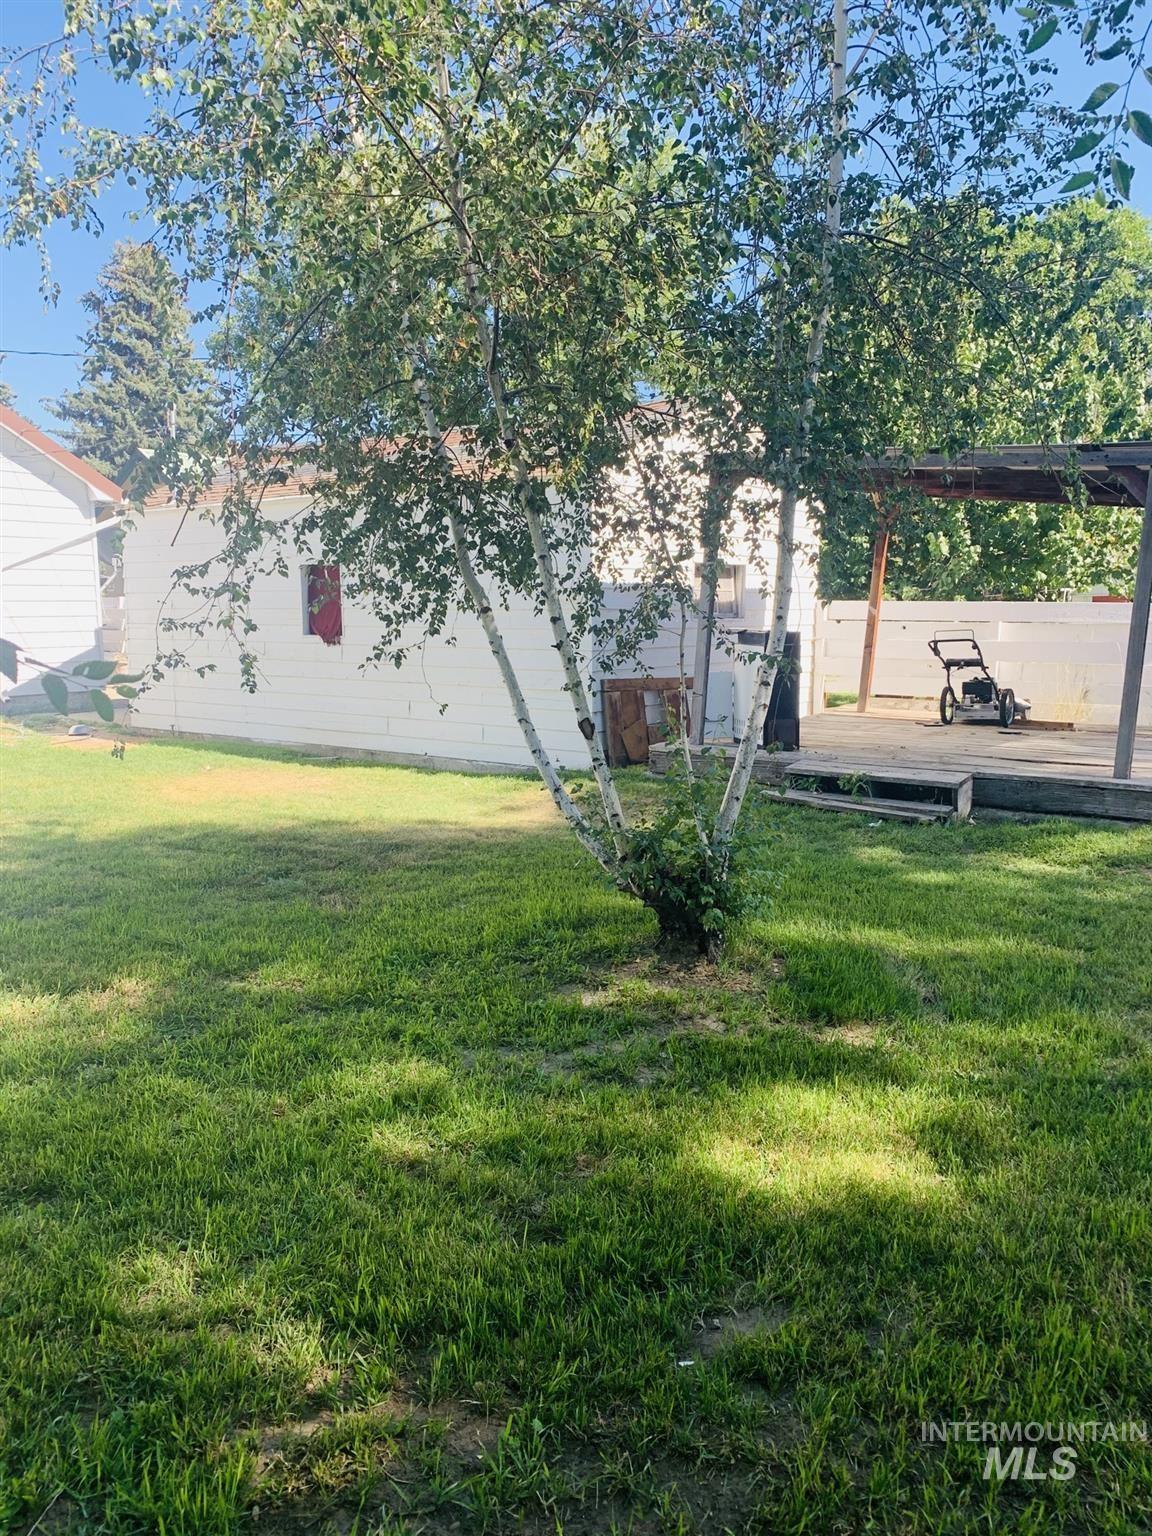 Photo of 813 Wyoming Street, Gooding, ID 83330 (MLS # 98774262)